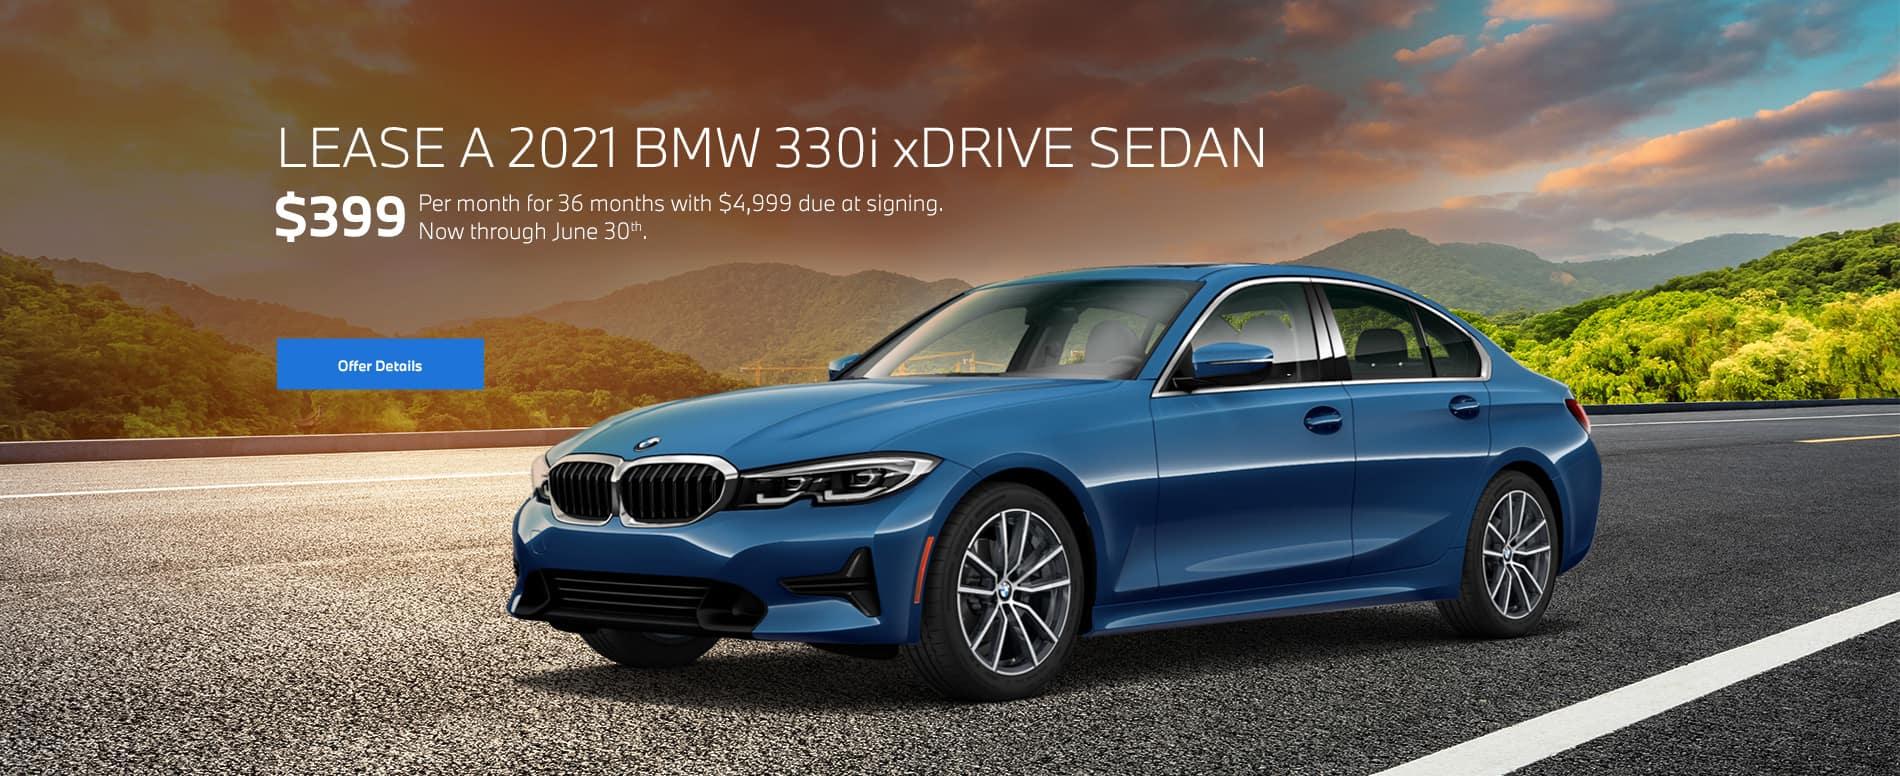 PUSH_BMW_2021_330i_xDrive_Sedan_399_1900x776_Desktop (1)